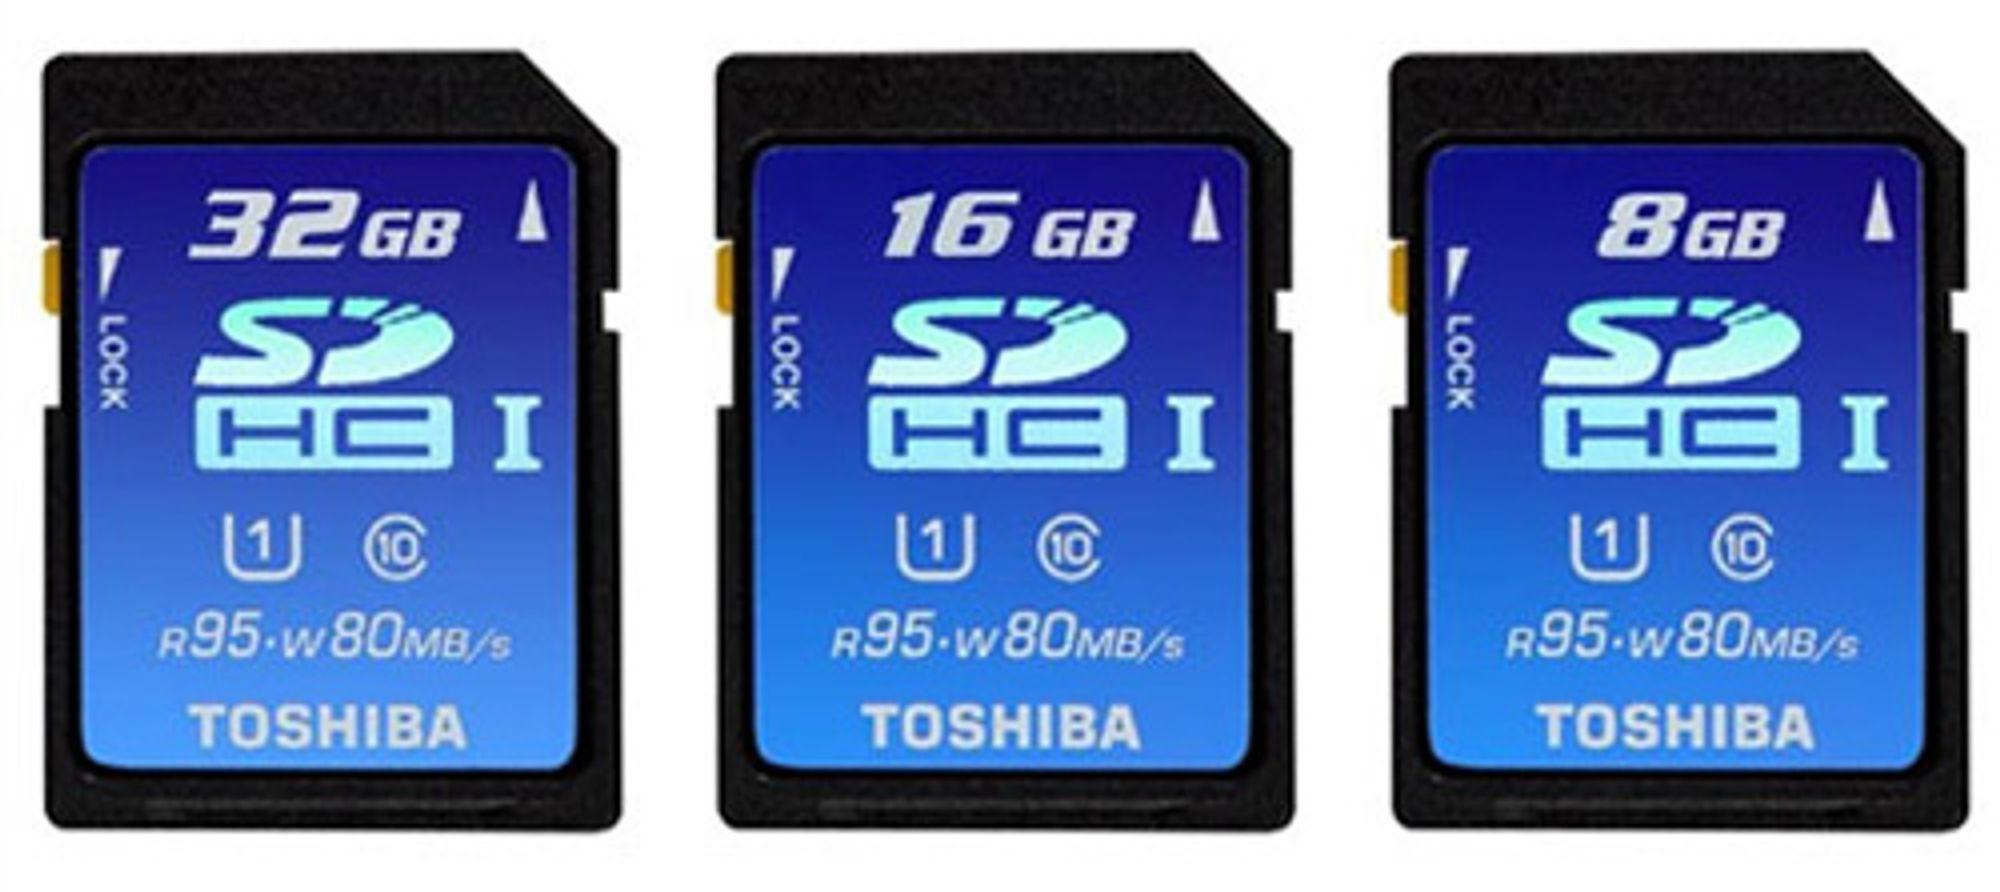 8GB, 16GB og 32GB SDHC-minnekort fra Toshiba,